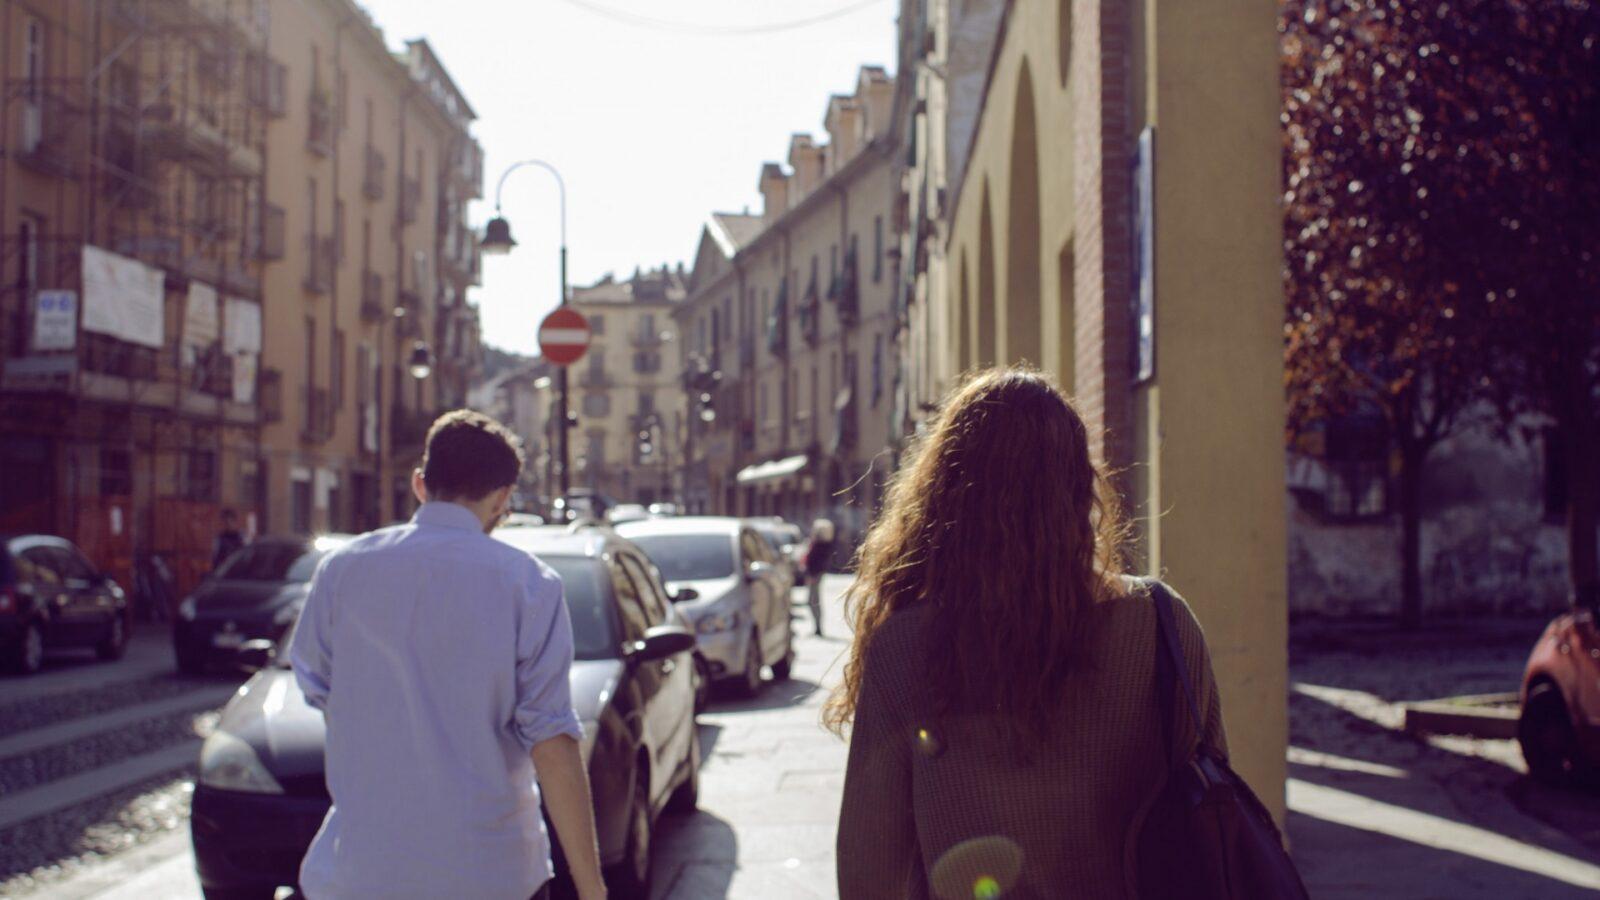 Ожидания разрушают отношения. Как избежать краха?